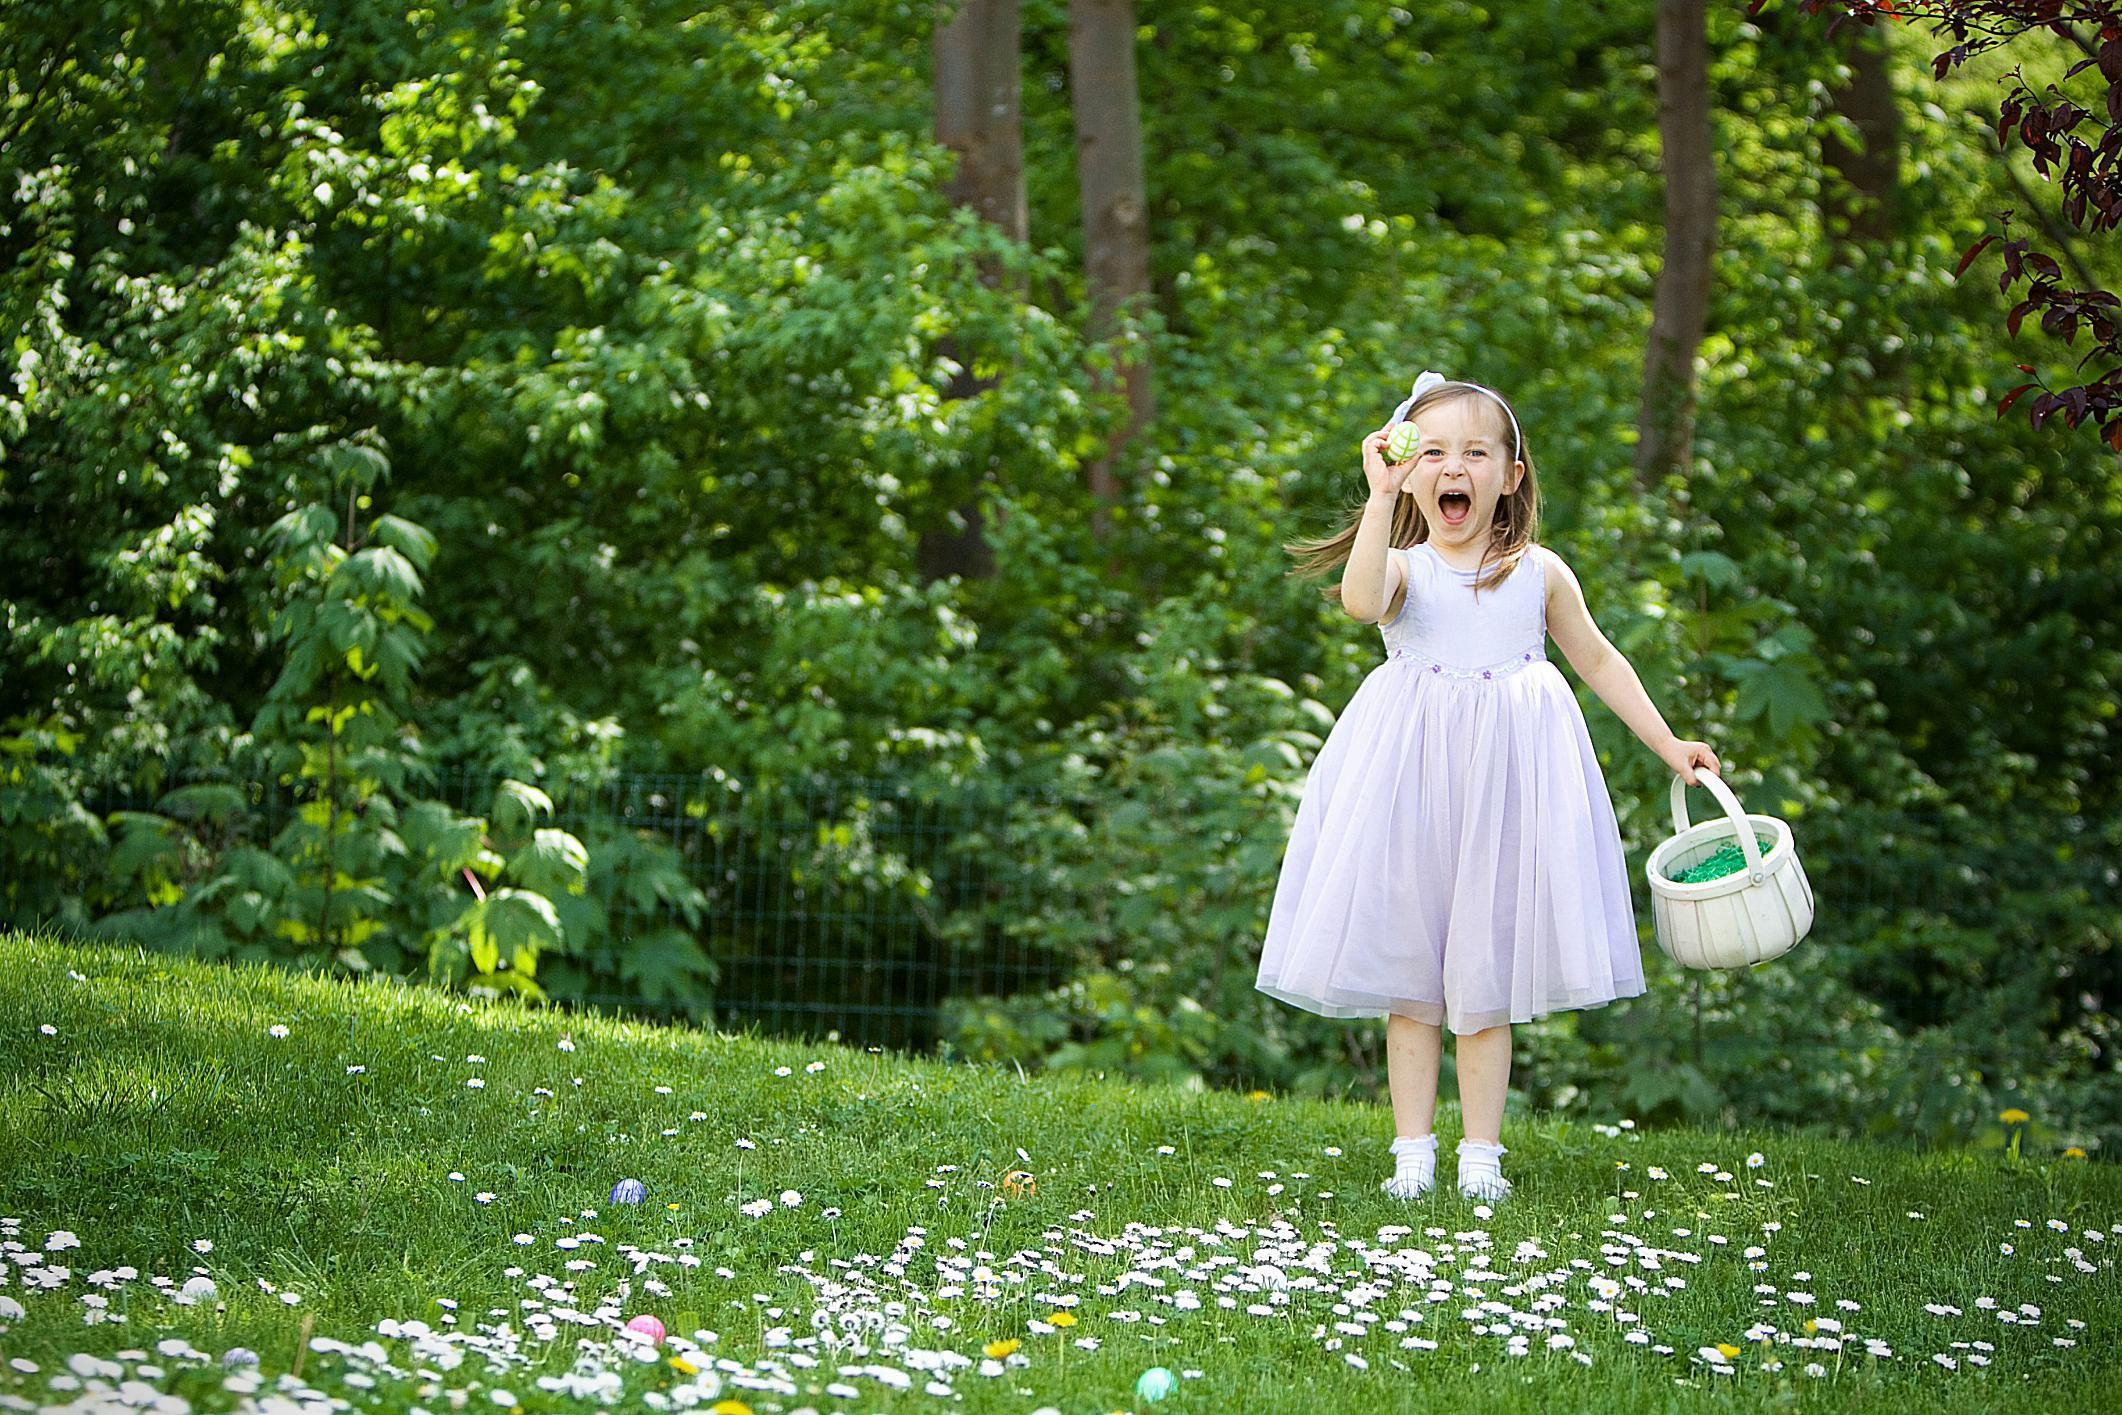 A girl finding an Easter egg